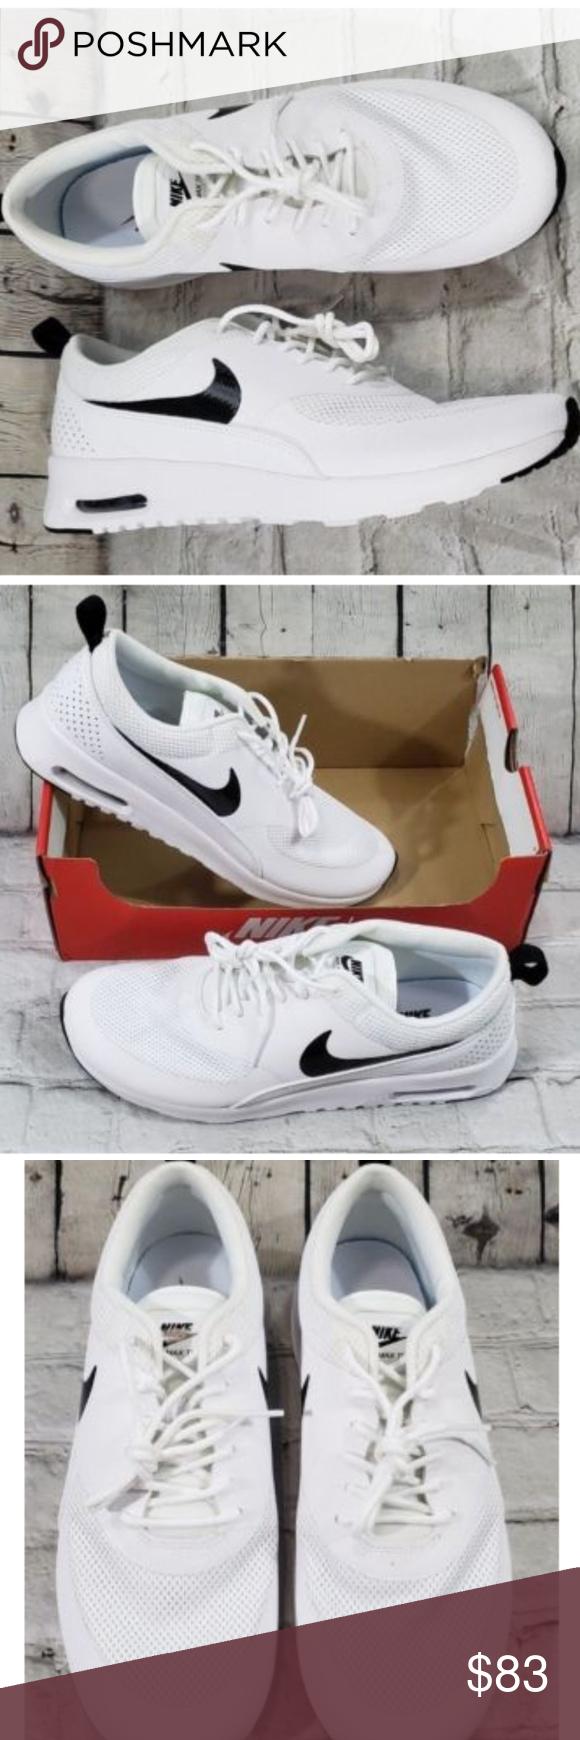 33++ Best running shoes 2019 womens ideas ideas in 2021